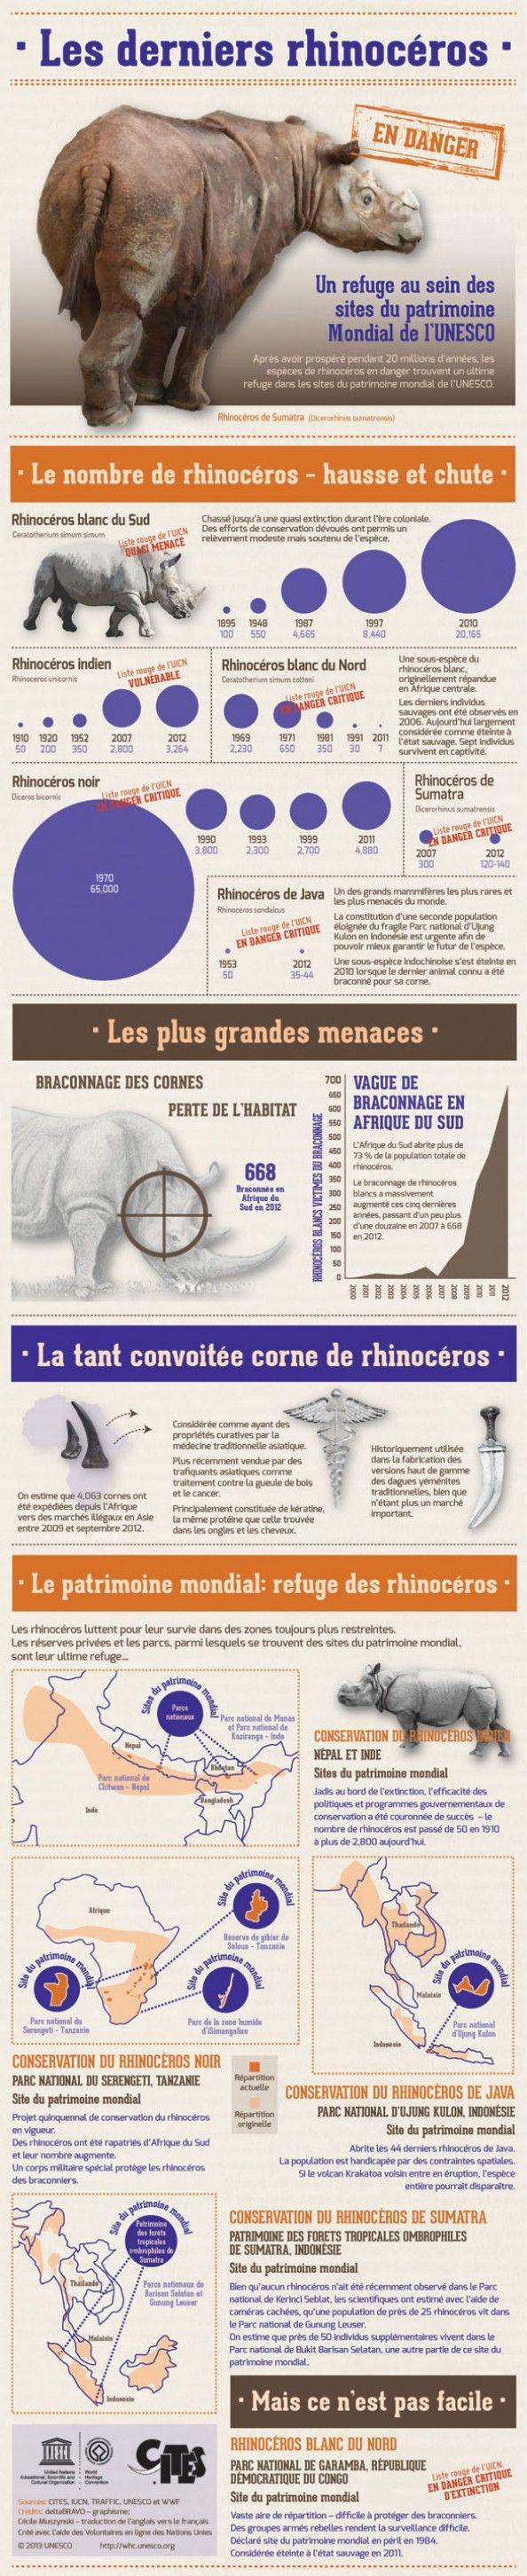 Les derniers rhinocéros Infographic